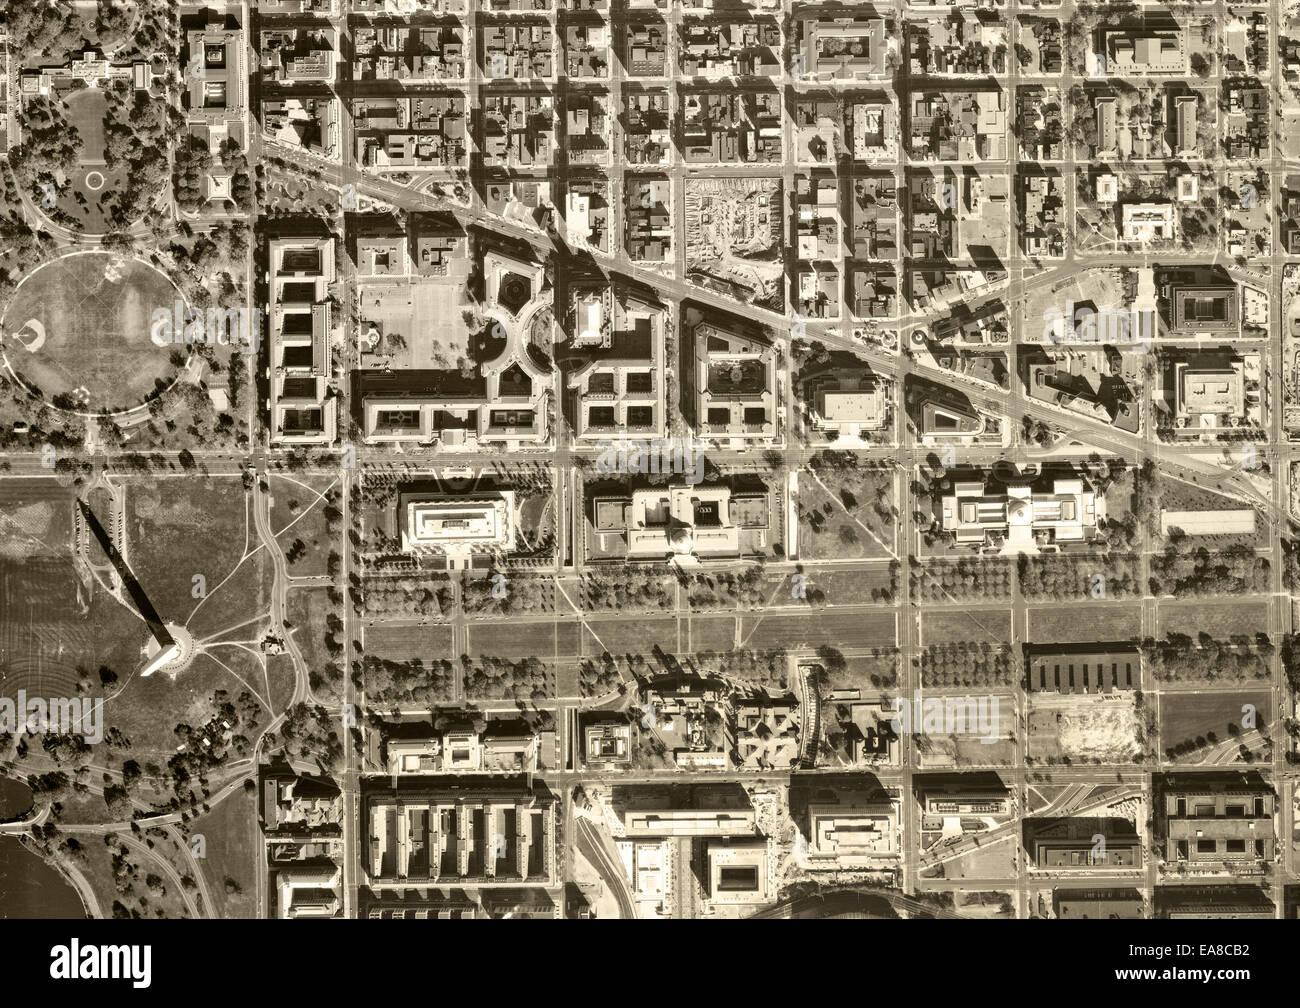 historical aerial photograph of Capitol Mall, Washington Monument, Washington, DC, 1968 - Stock Image